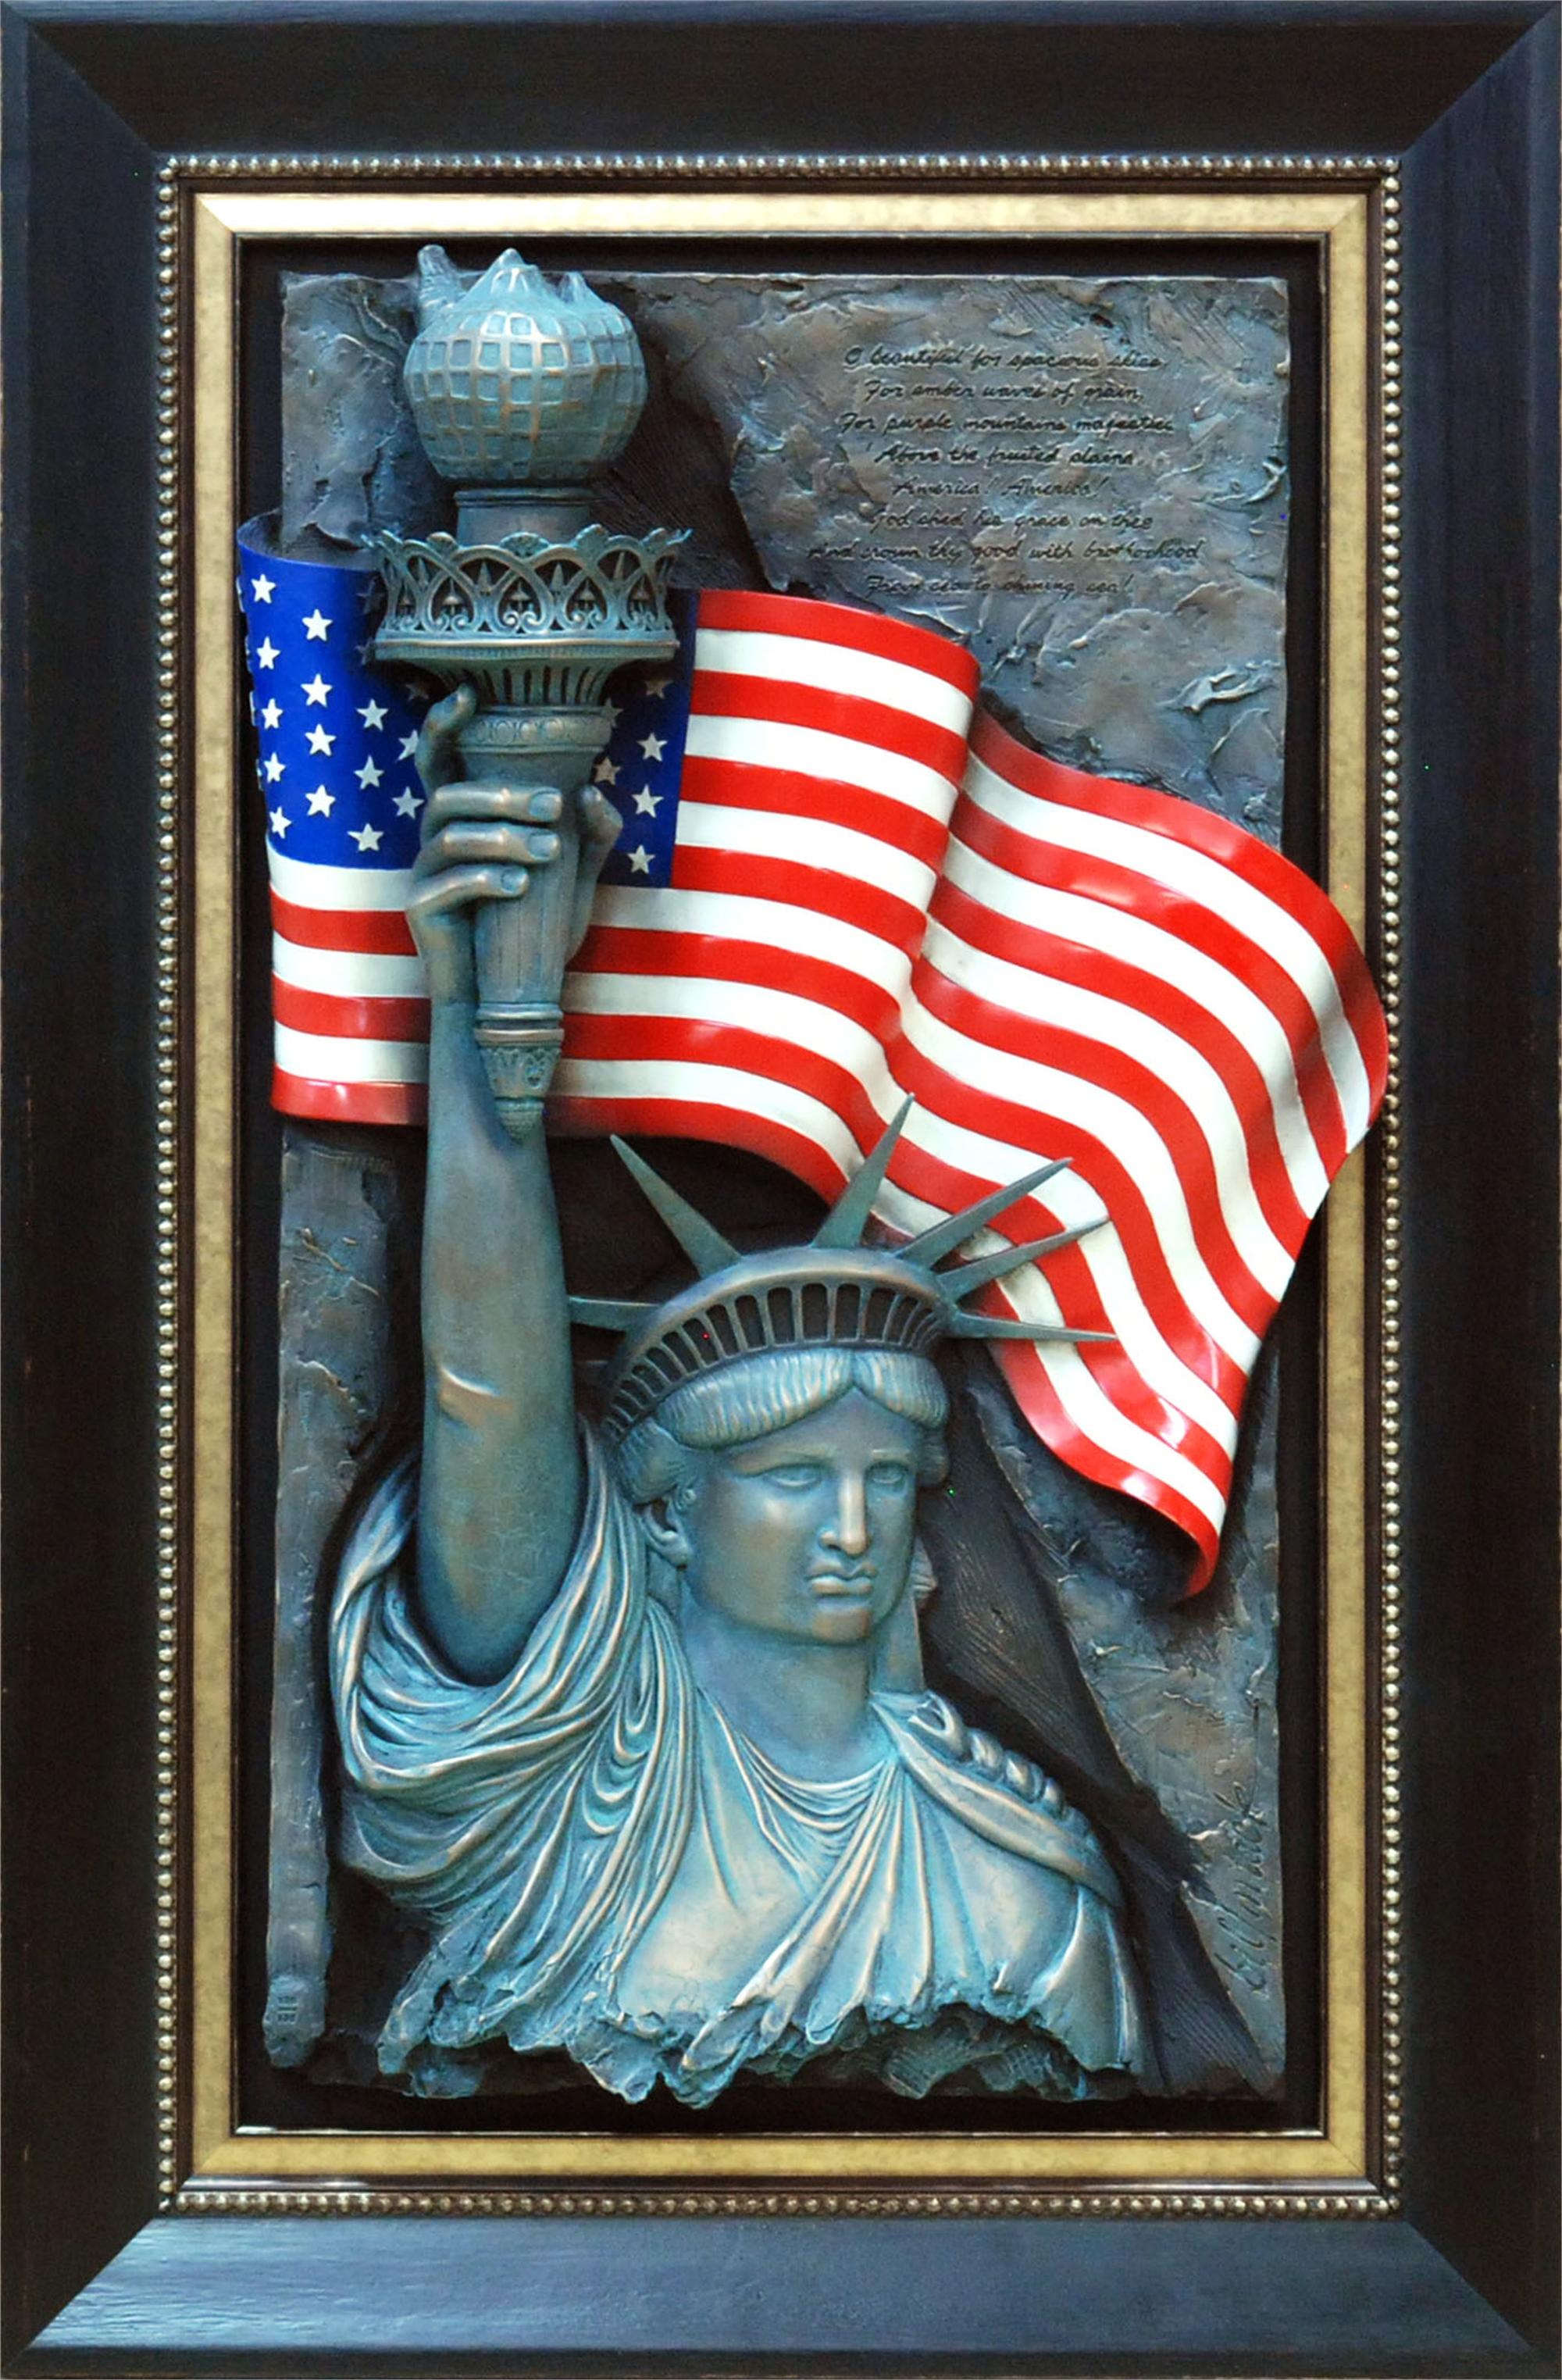 America by Bill Mack